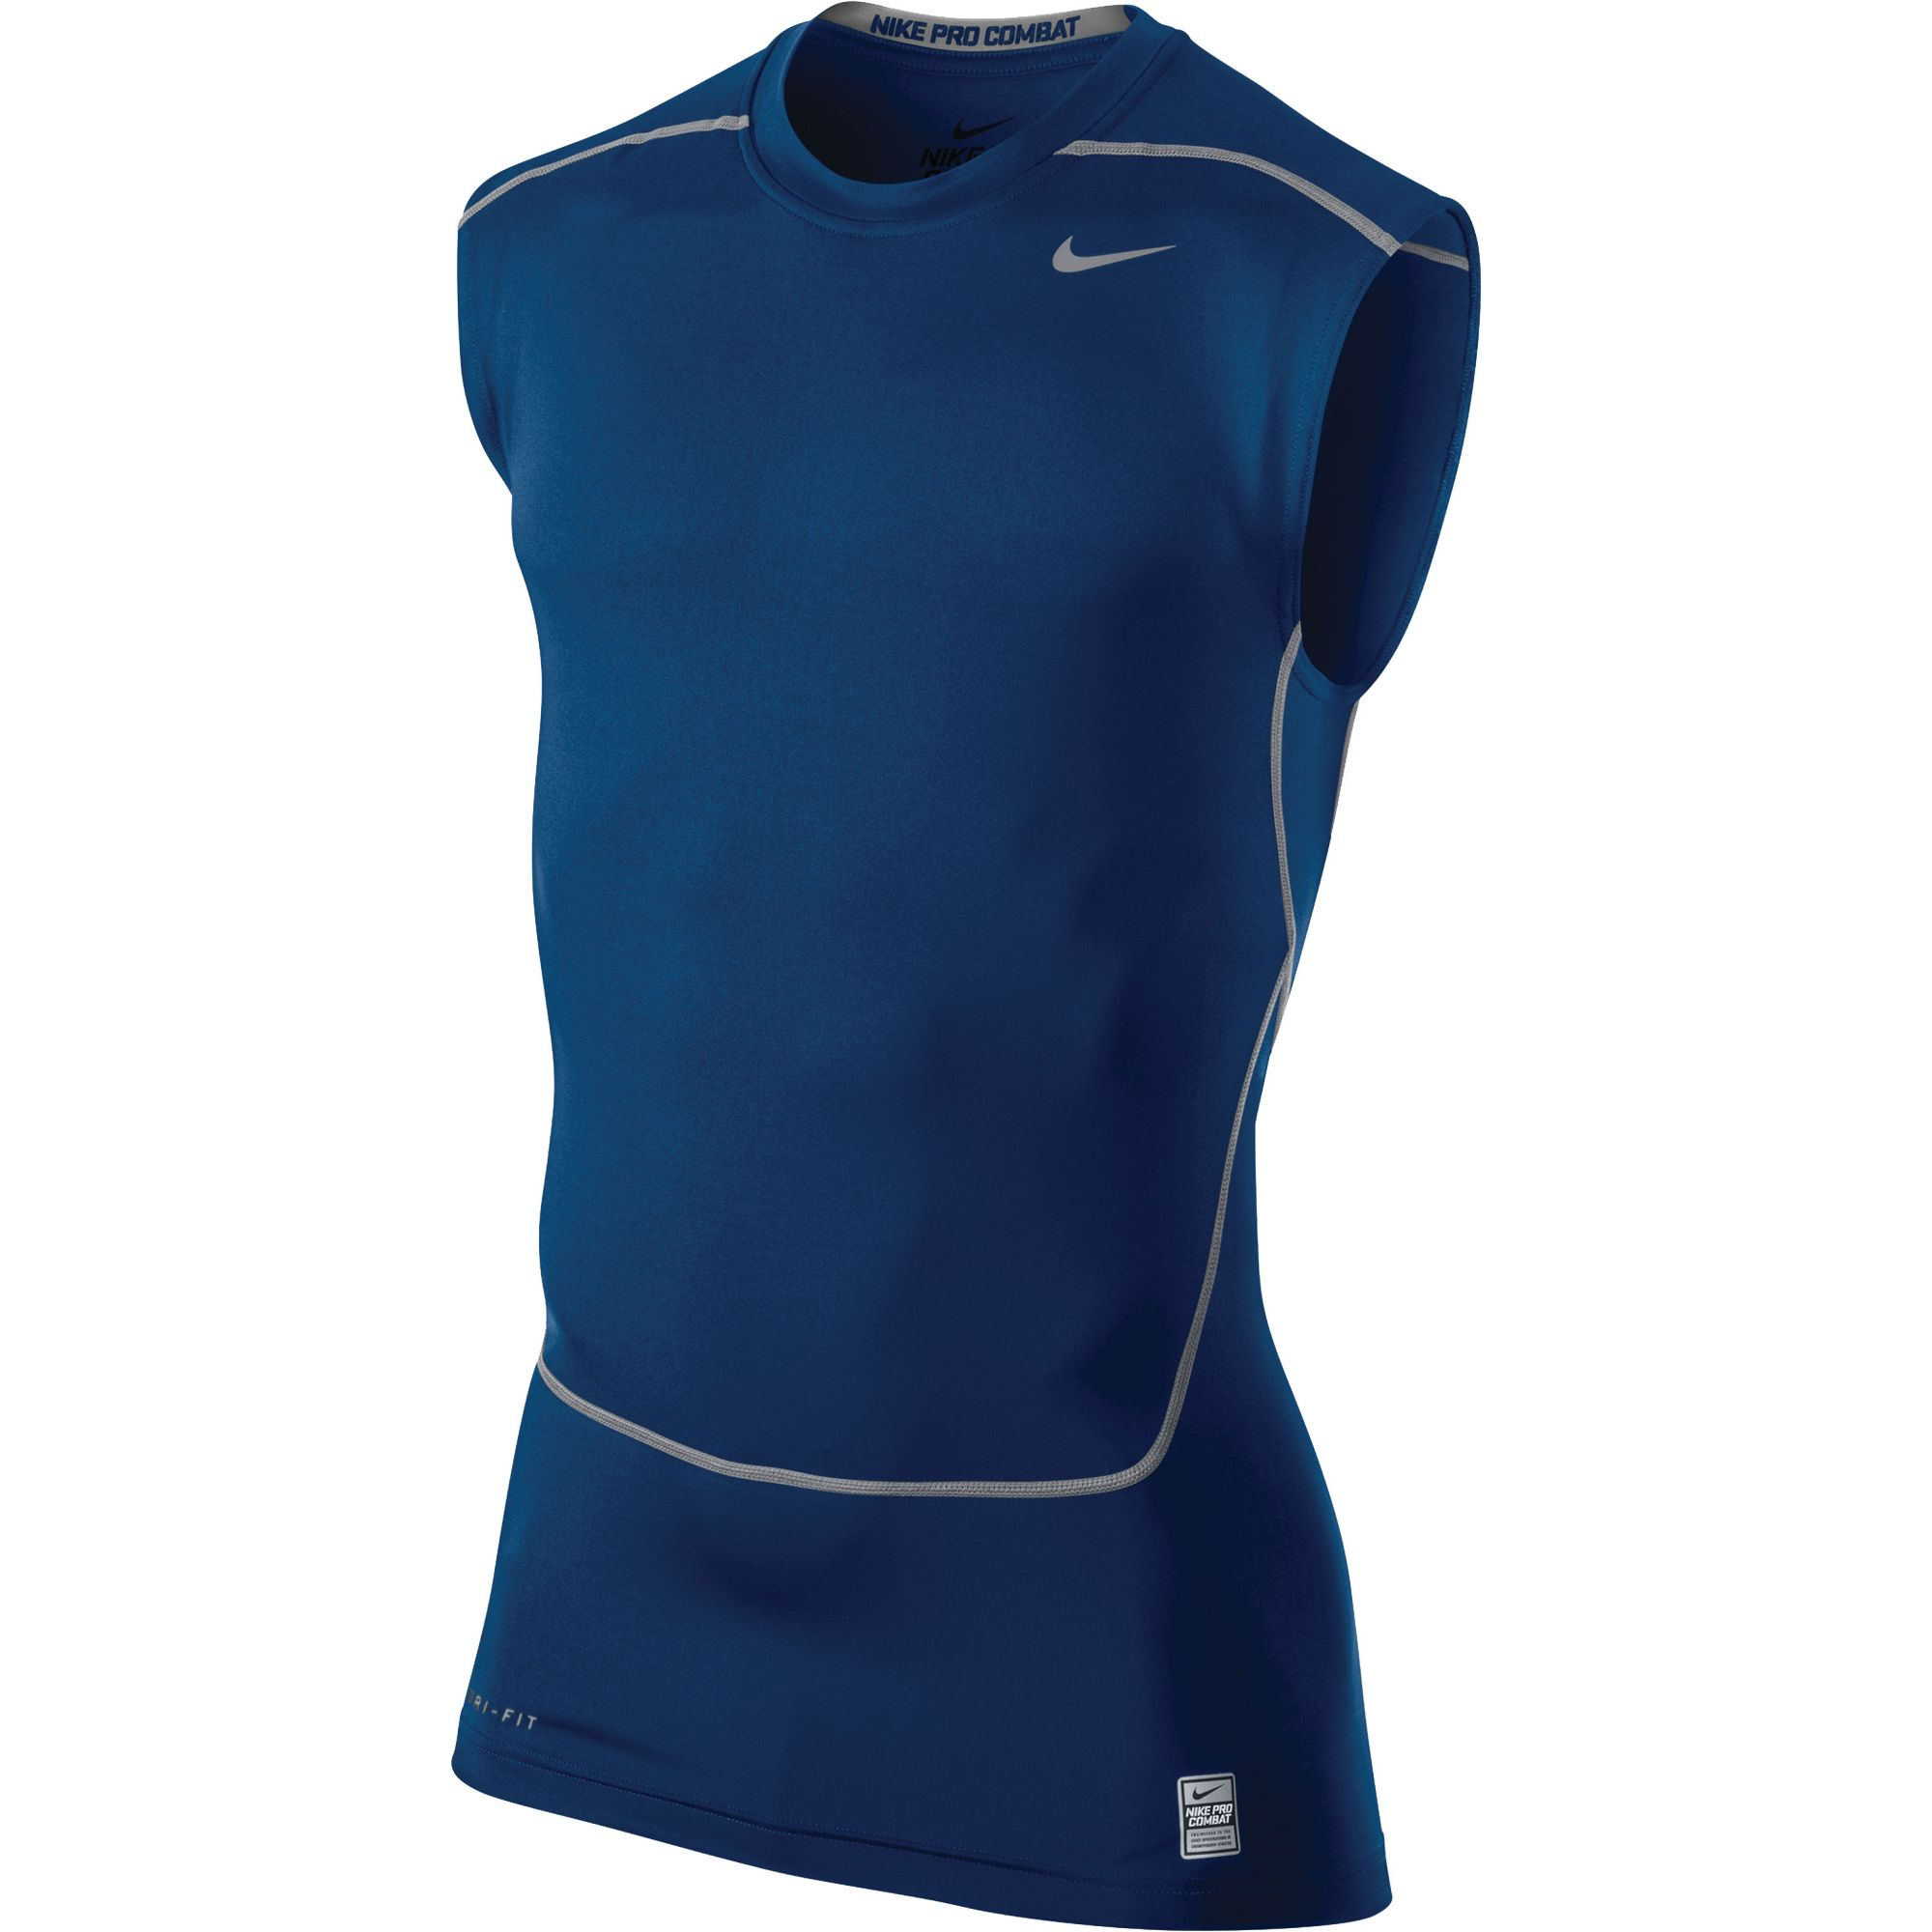 Nike men 39 s core 2 0 sleeveless compression training shirt for Nike men s pro cool sleeveless shirt